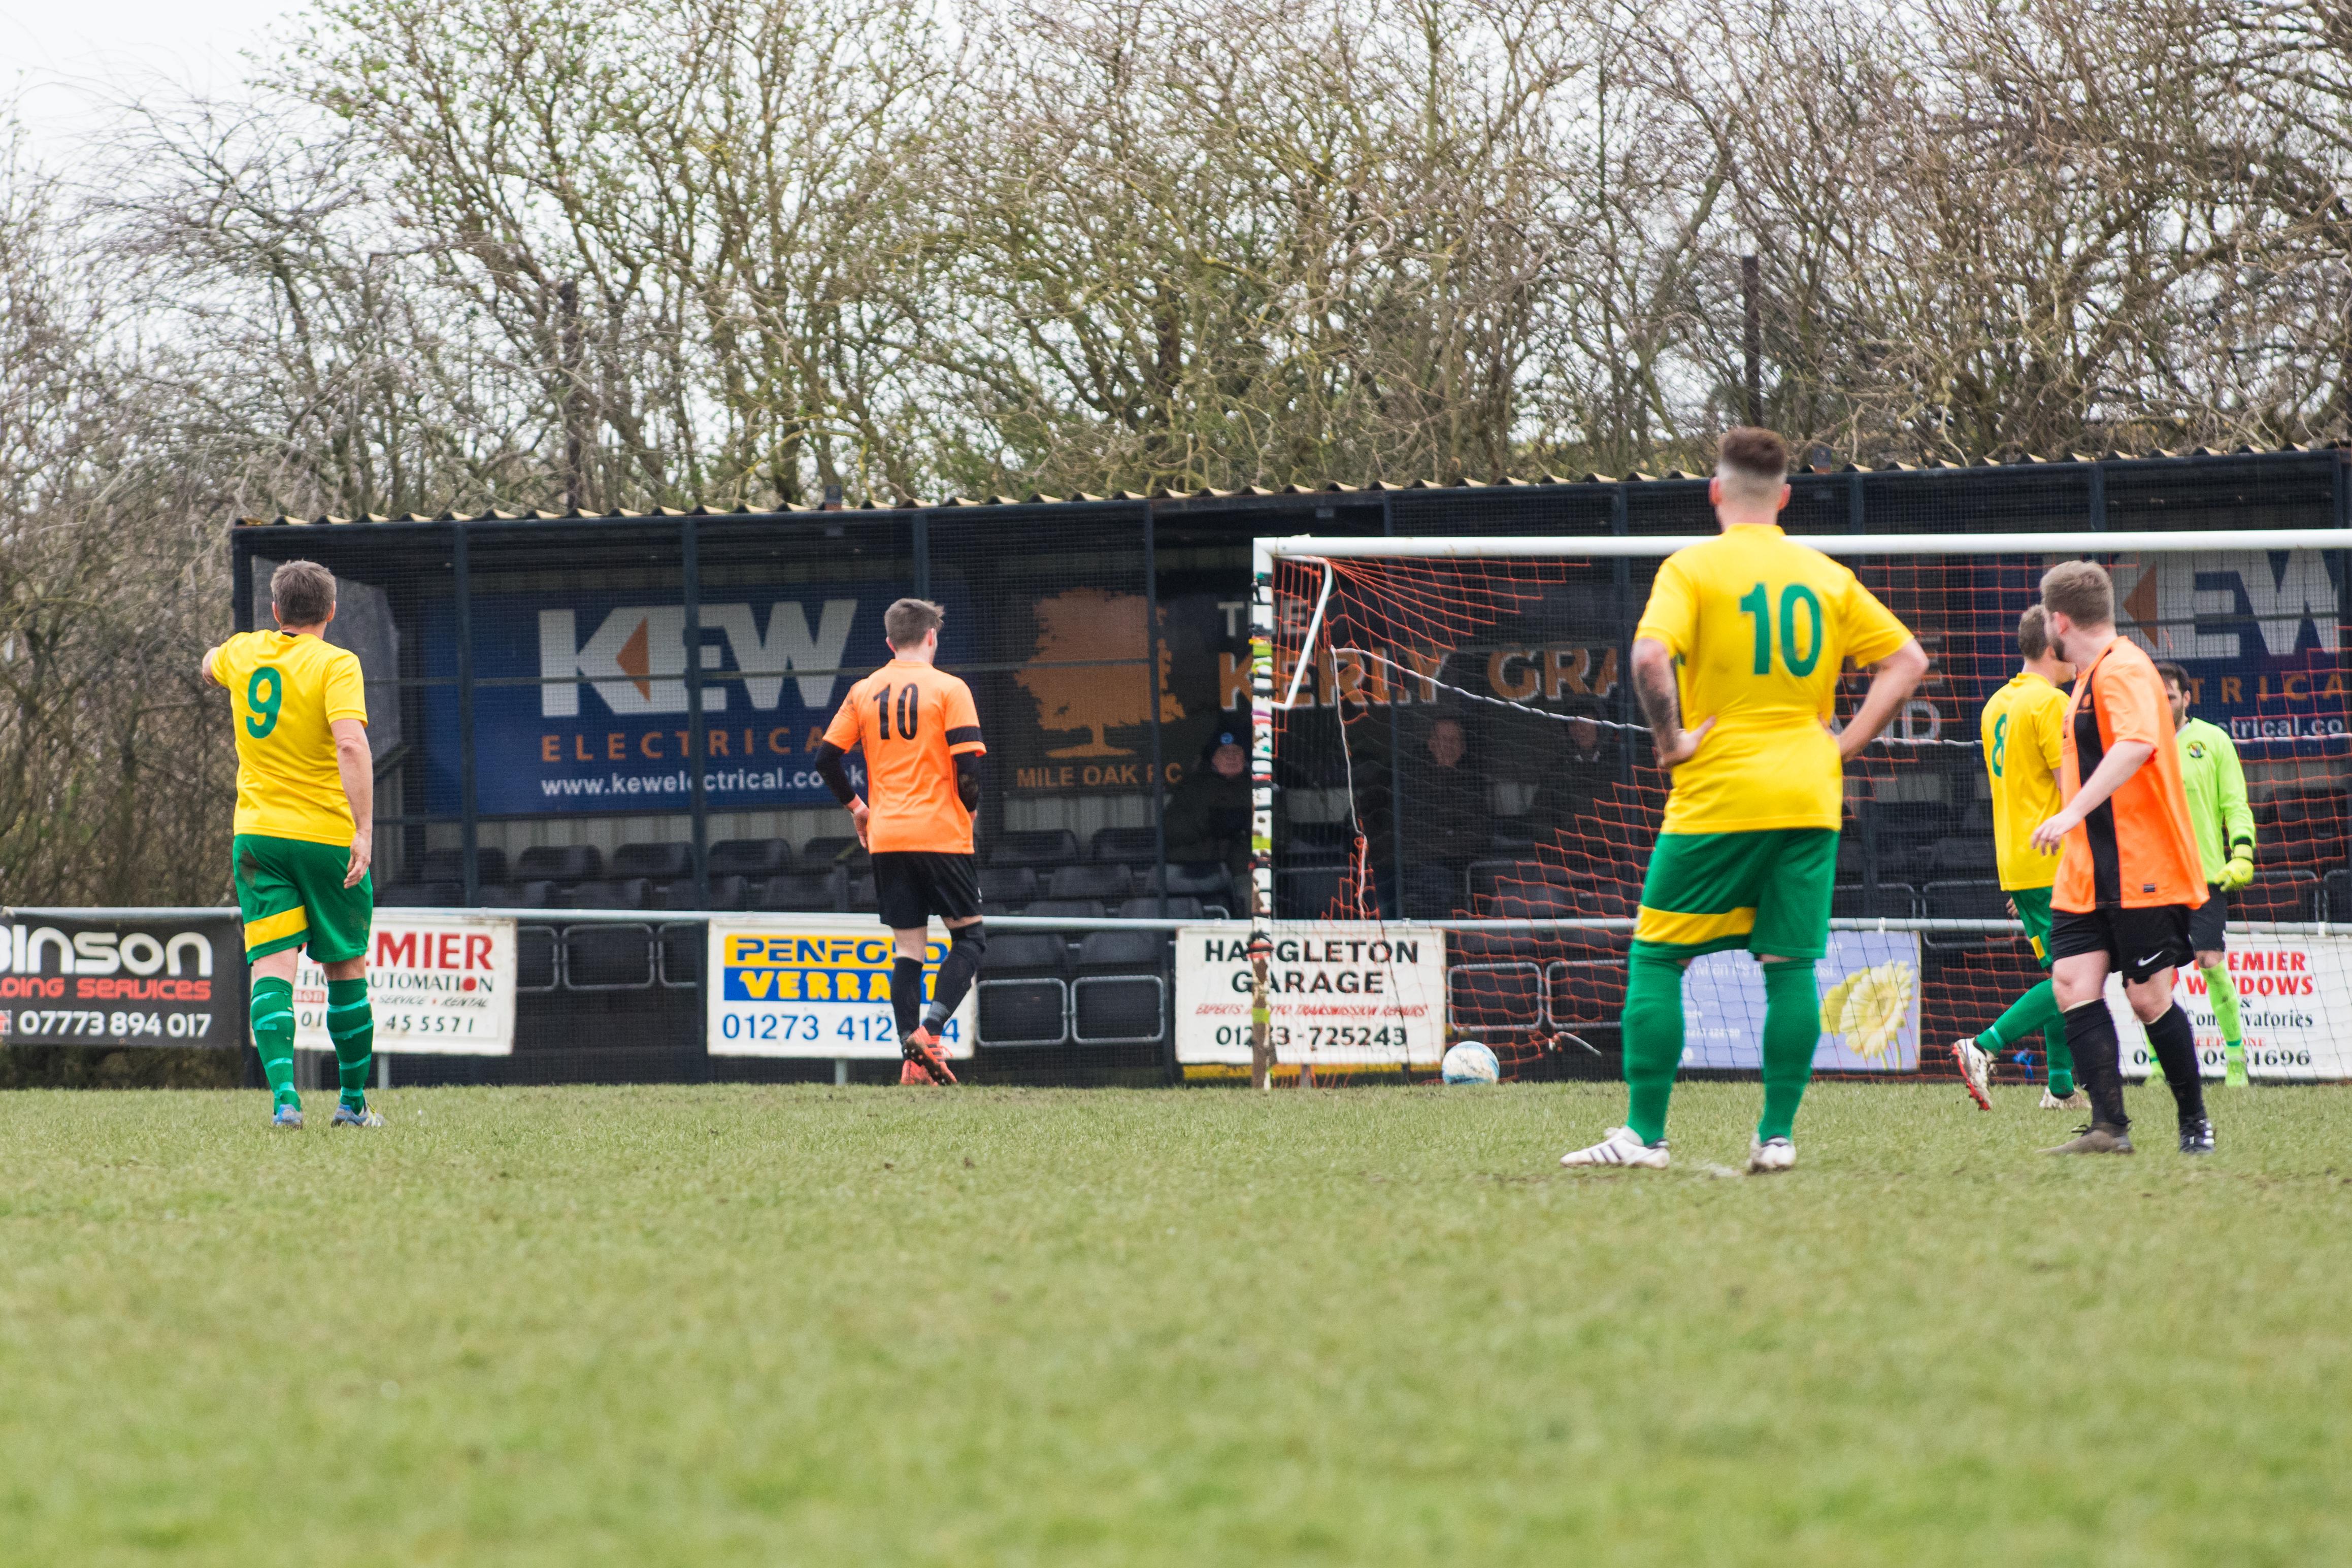 DAVID_JEFFERY Mile Oak FC vs Hailsham Town FC 24.03.18 73